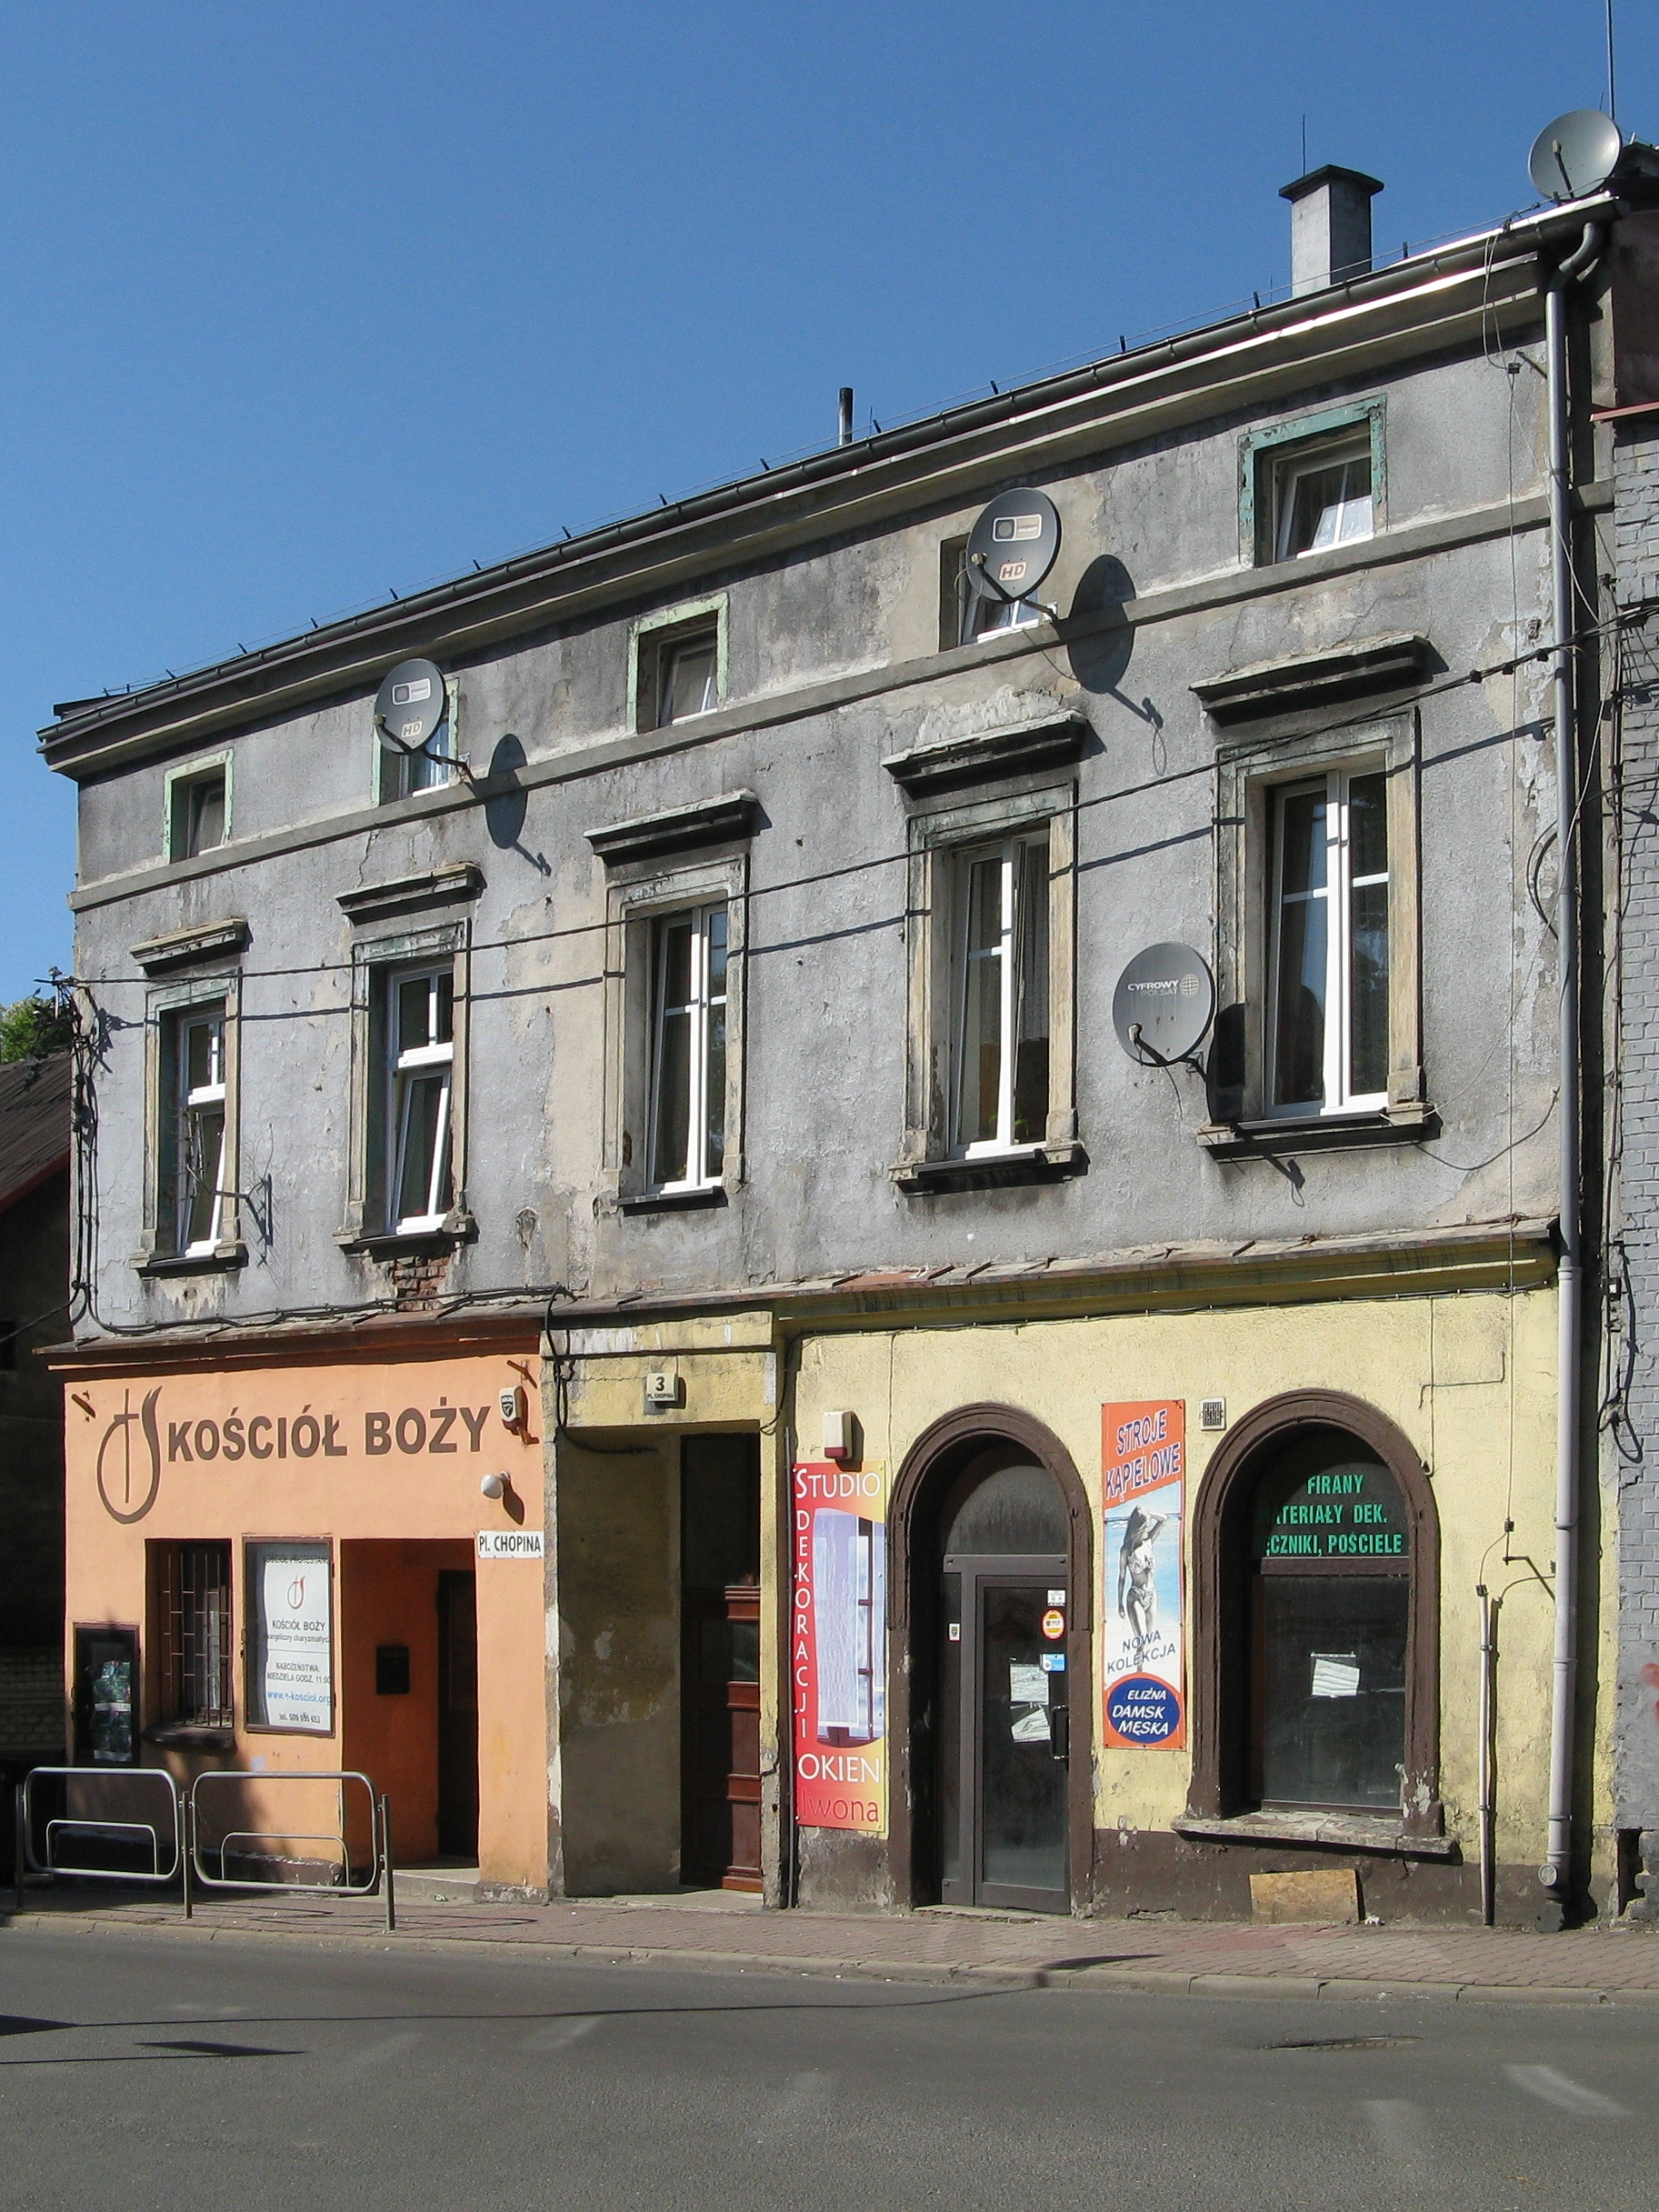 Plikruda Slaska Church Of Godjpg Wikipedia Wolna